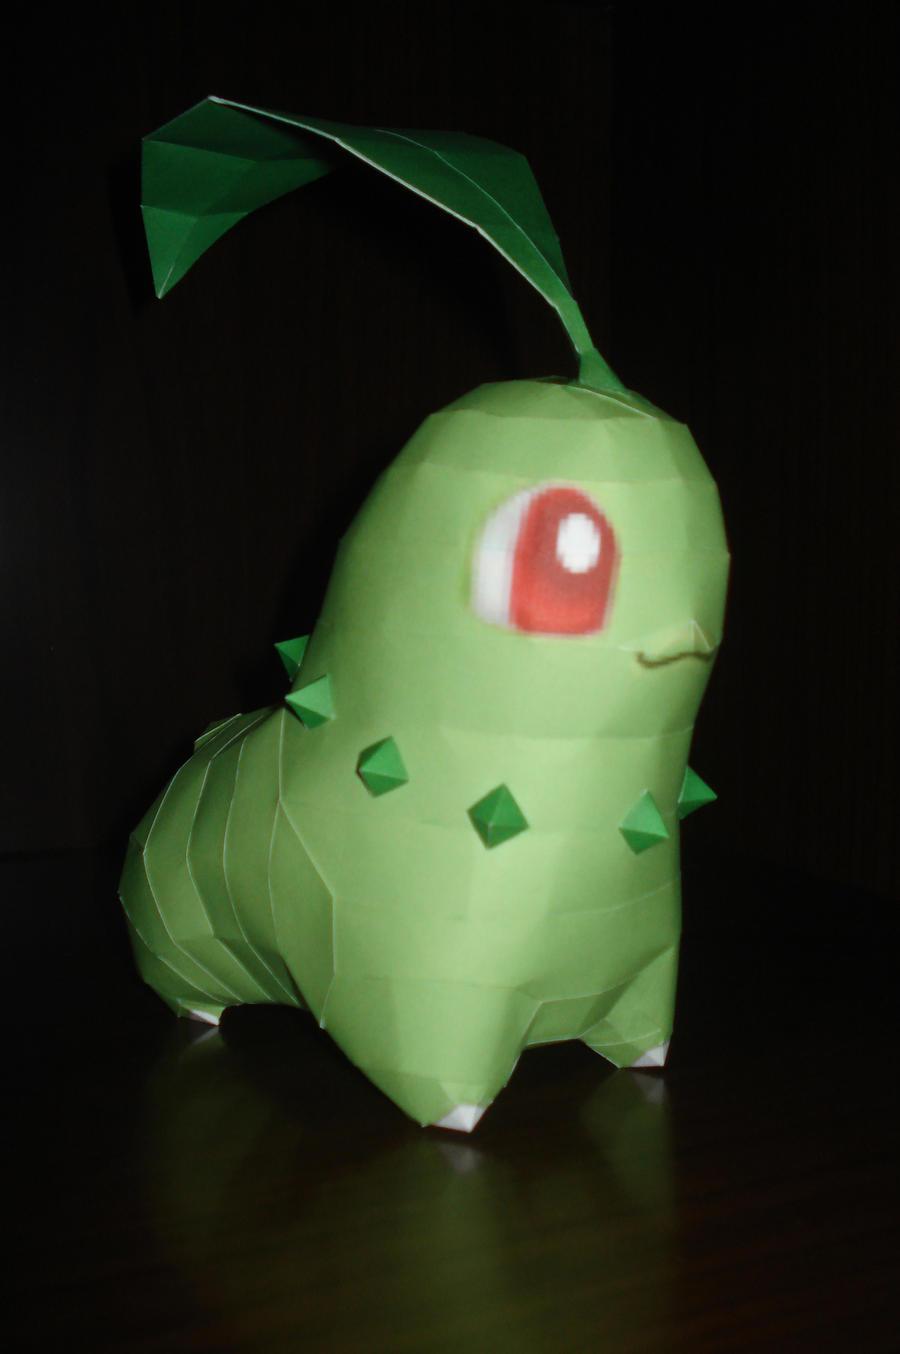 Chikorita - Green bean pokemon by Carnilmo